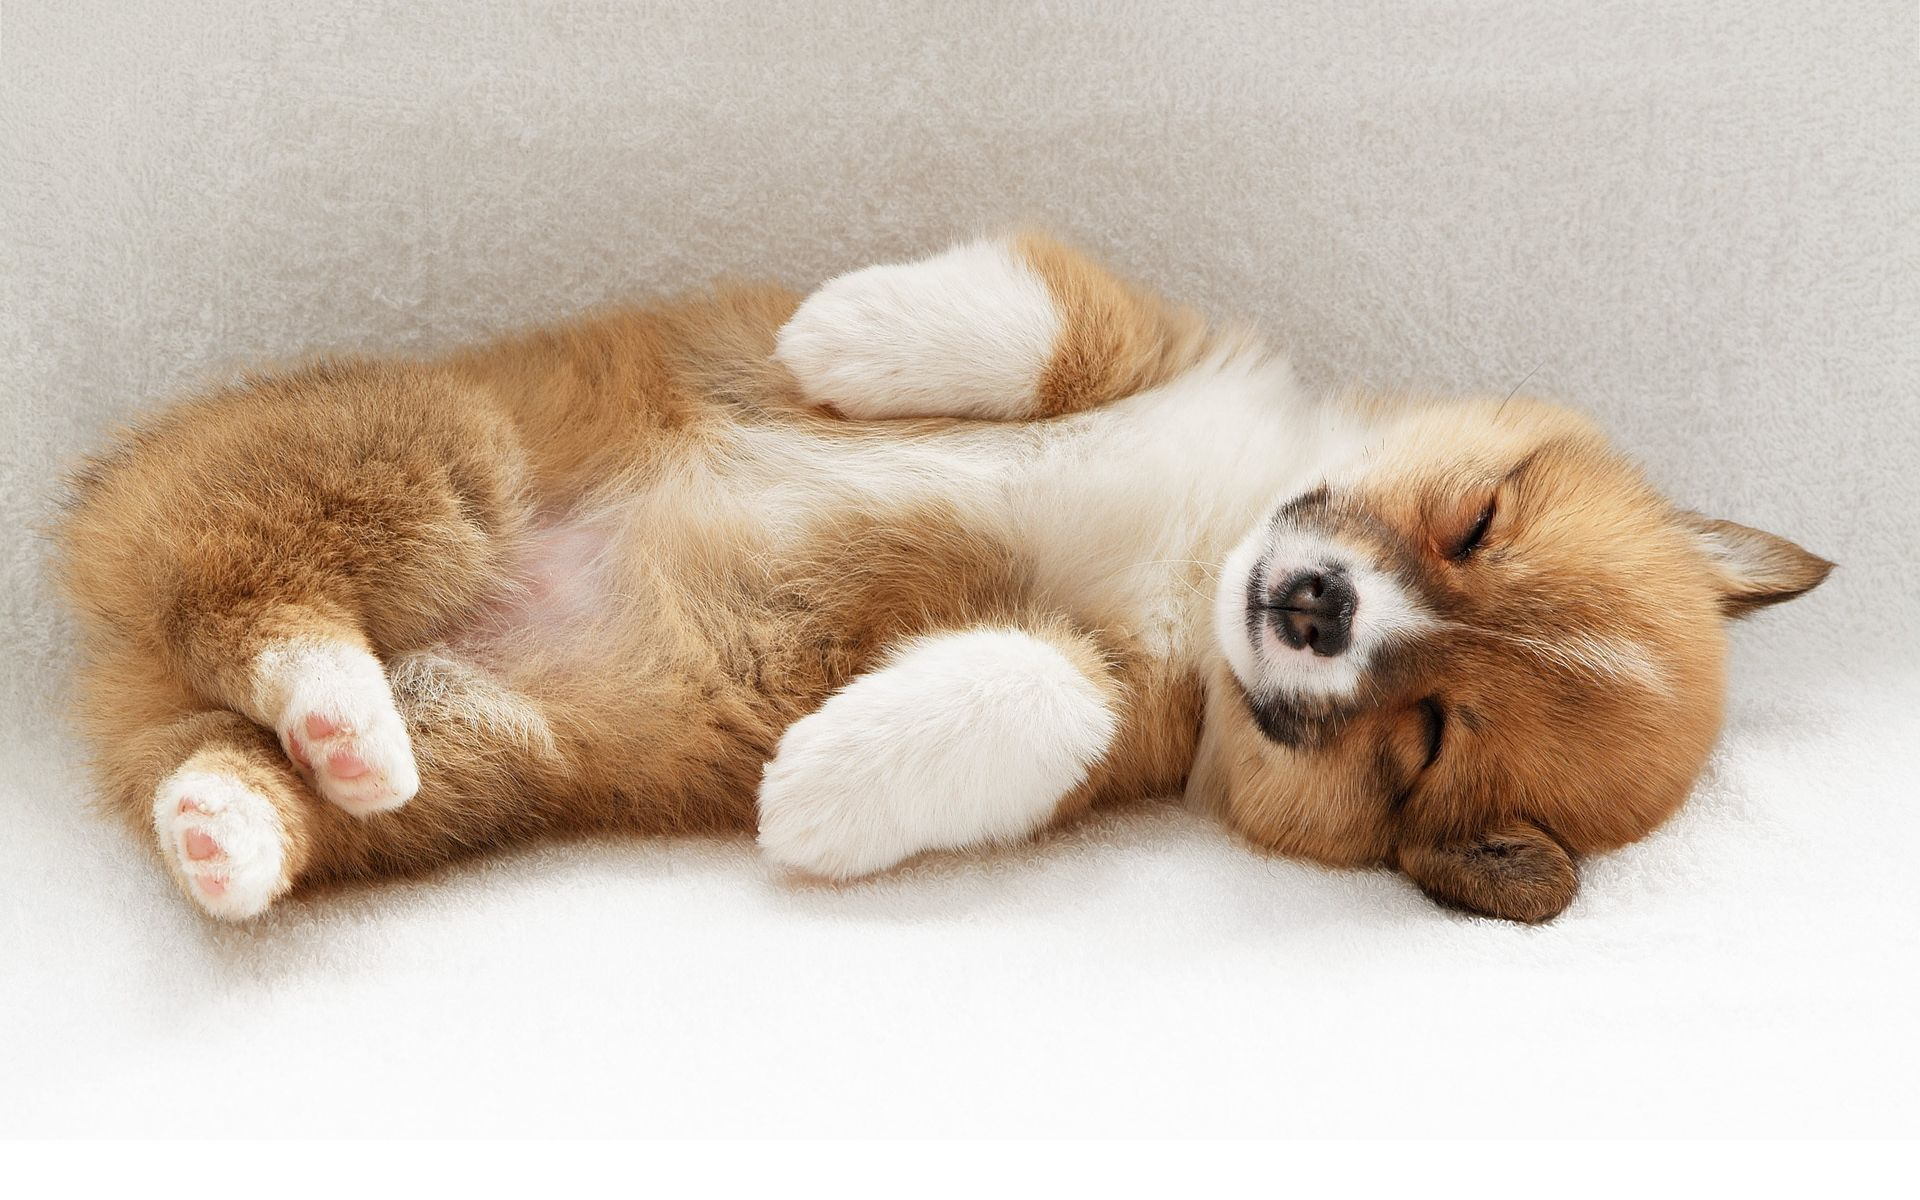 Puppies cute sleeping wallpaper 2019